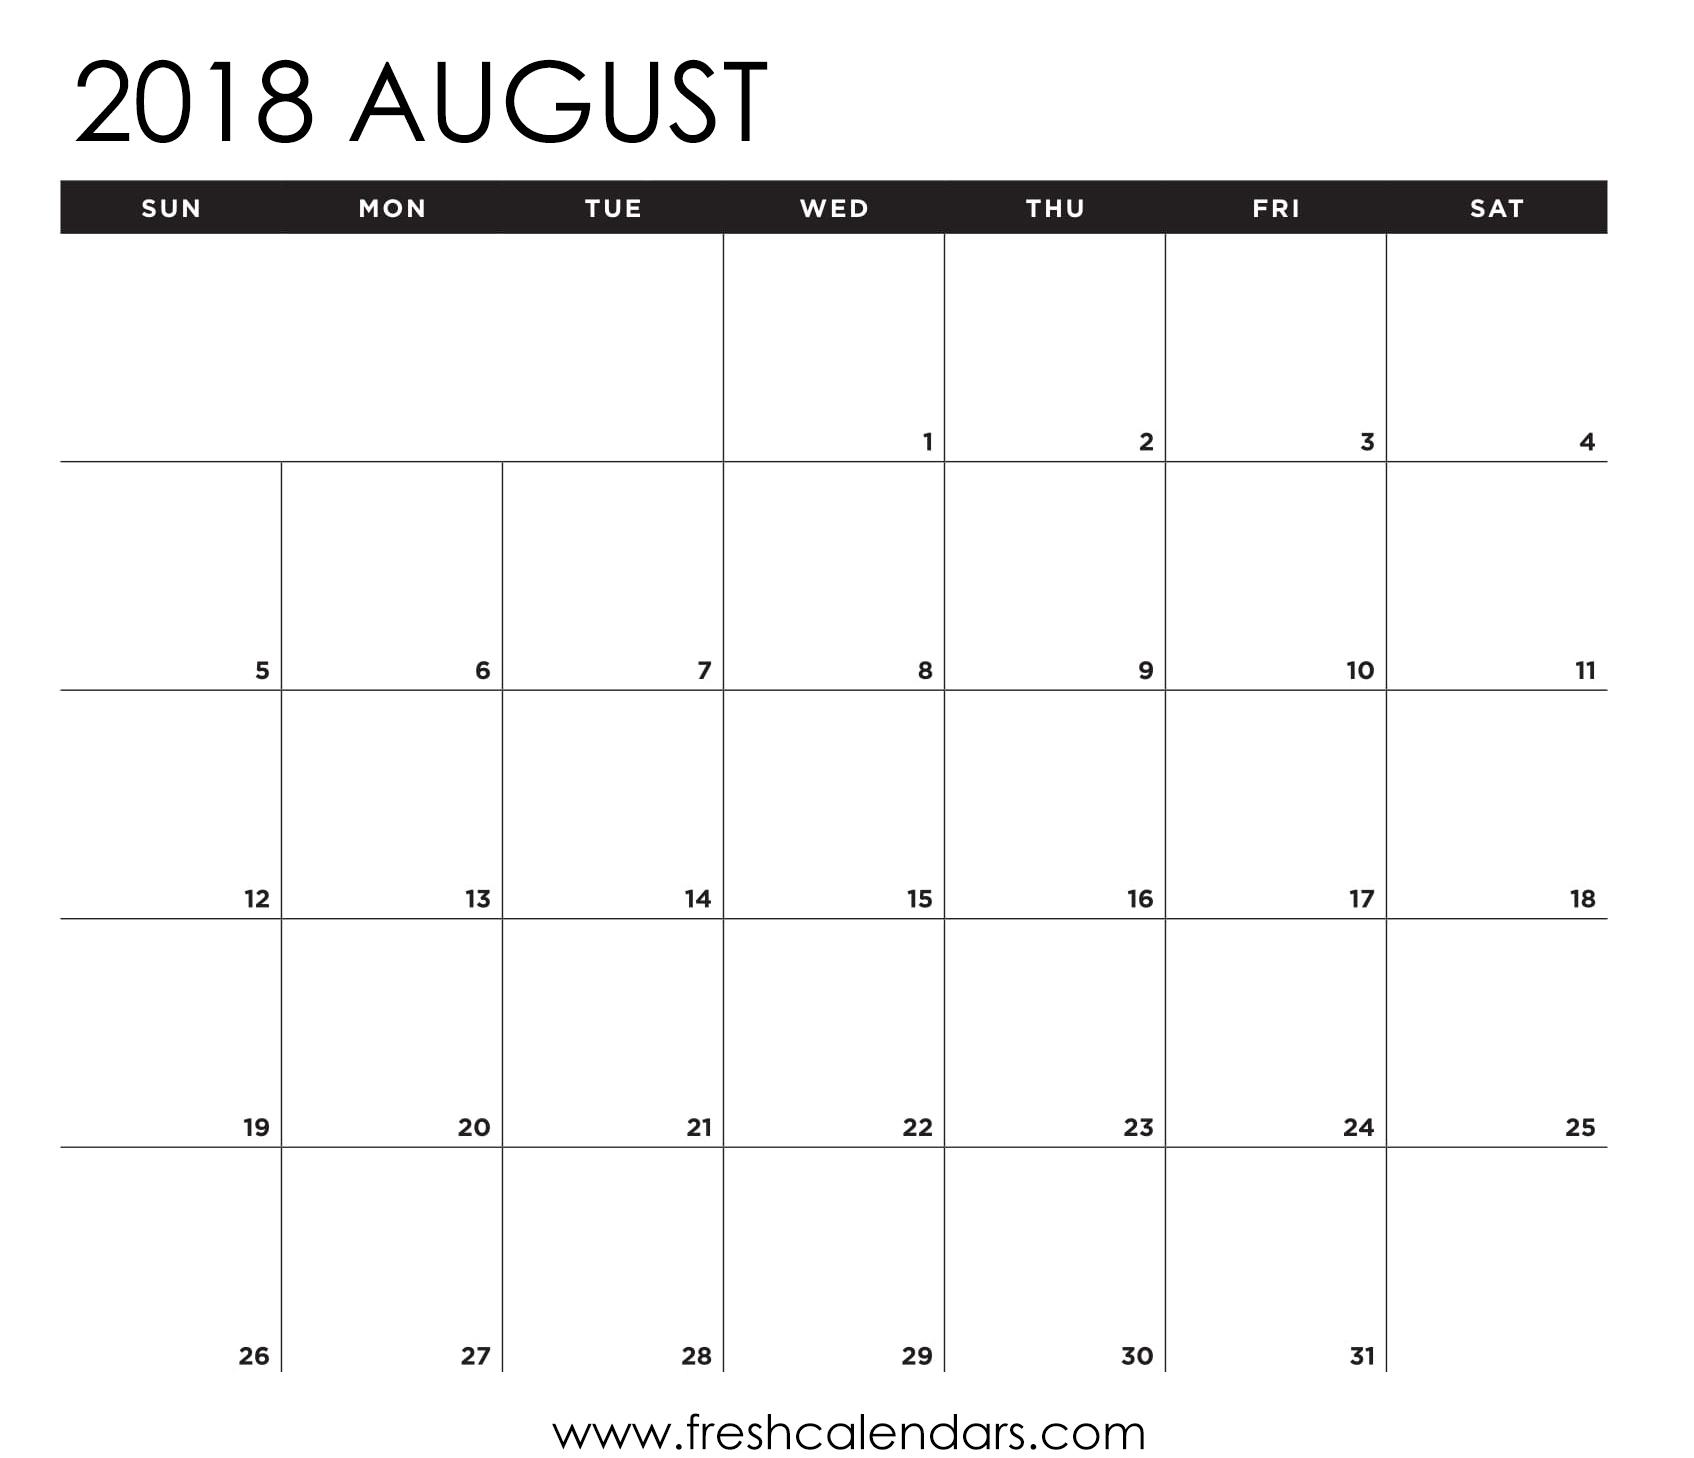 August 2018 Calendar Printable - Fresh Calendars inside Downloadable Calendar Templates August